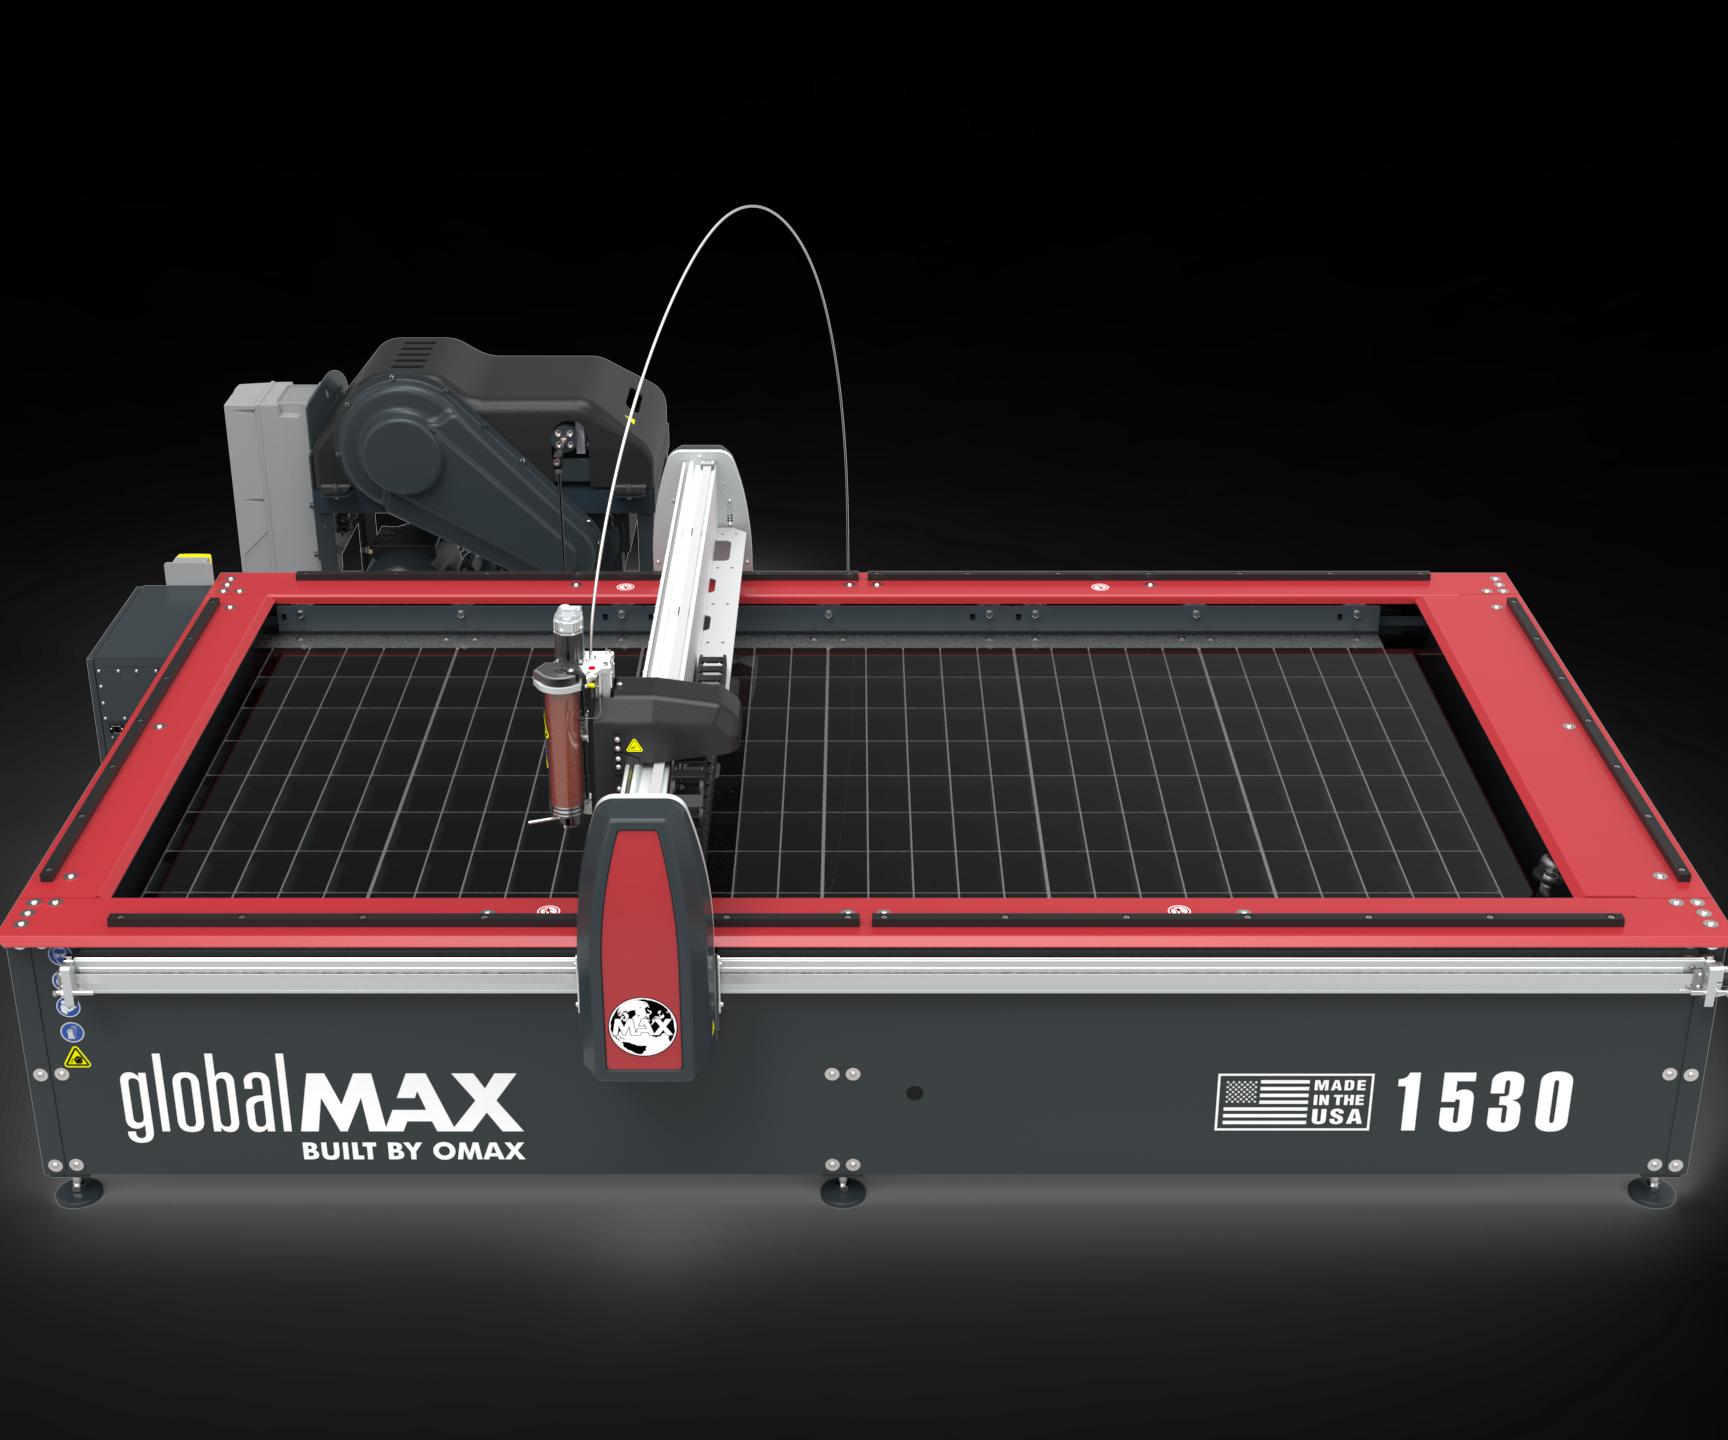 GlobalMAX 1530 waterjet